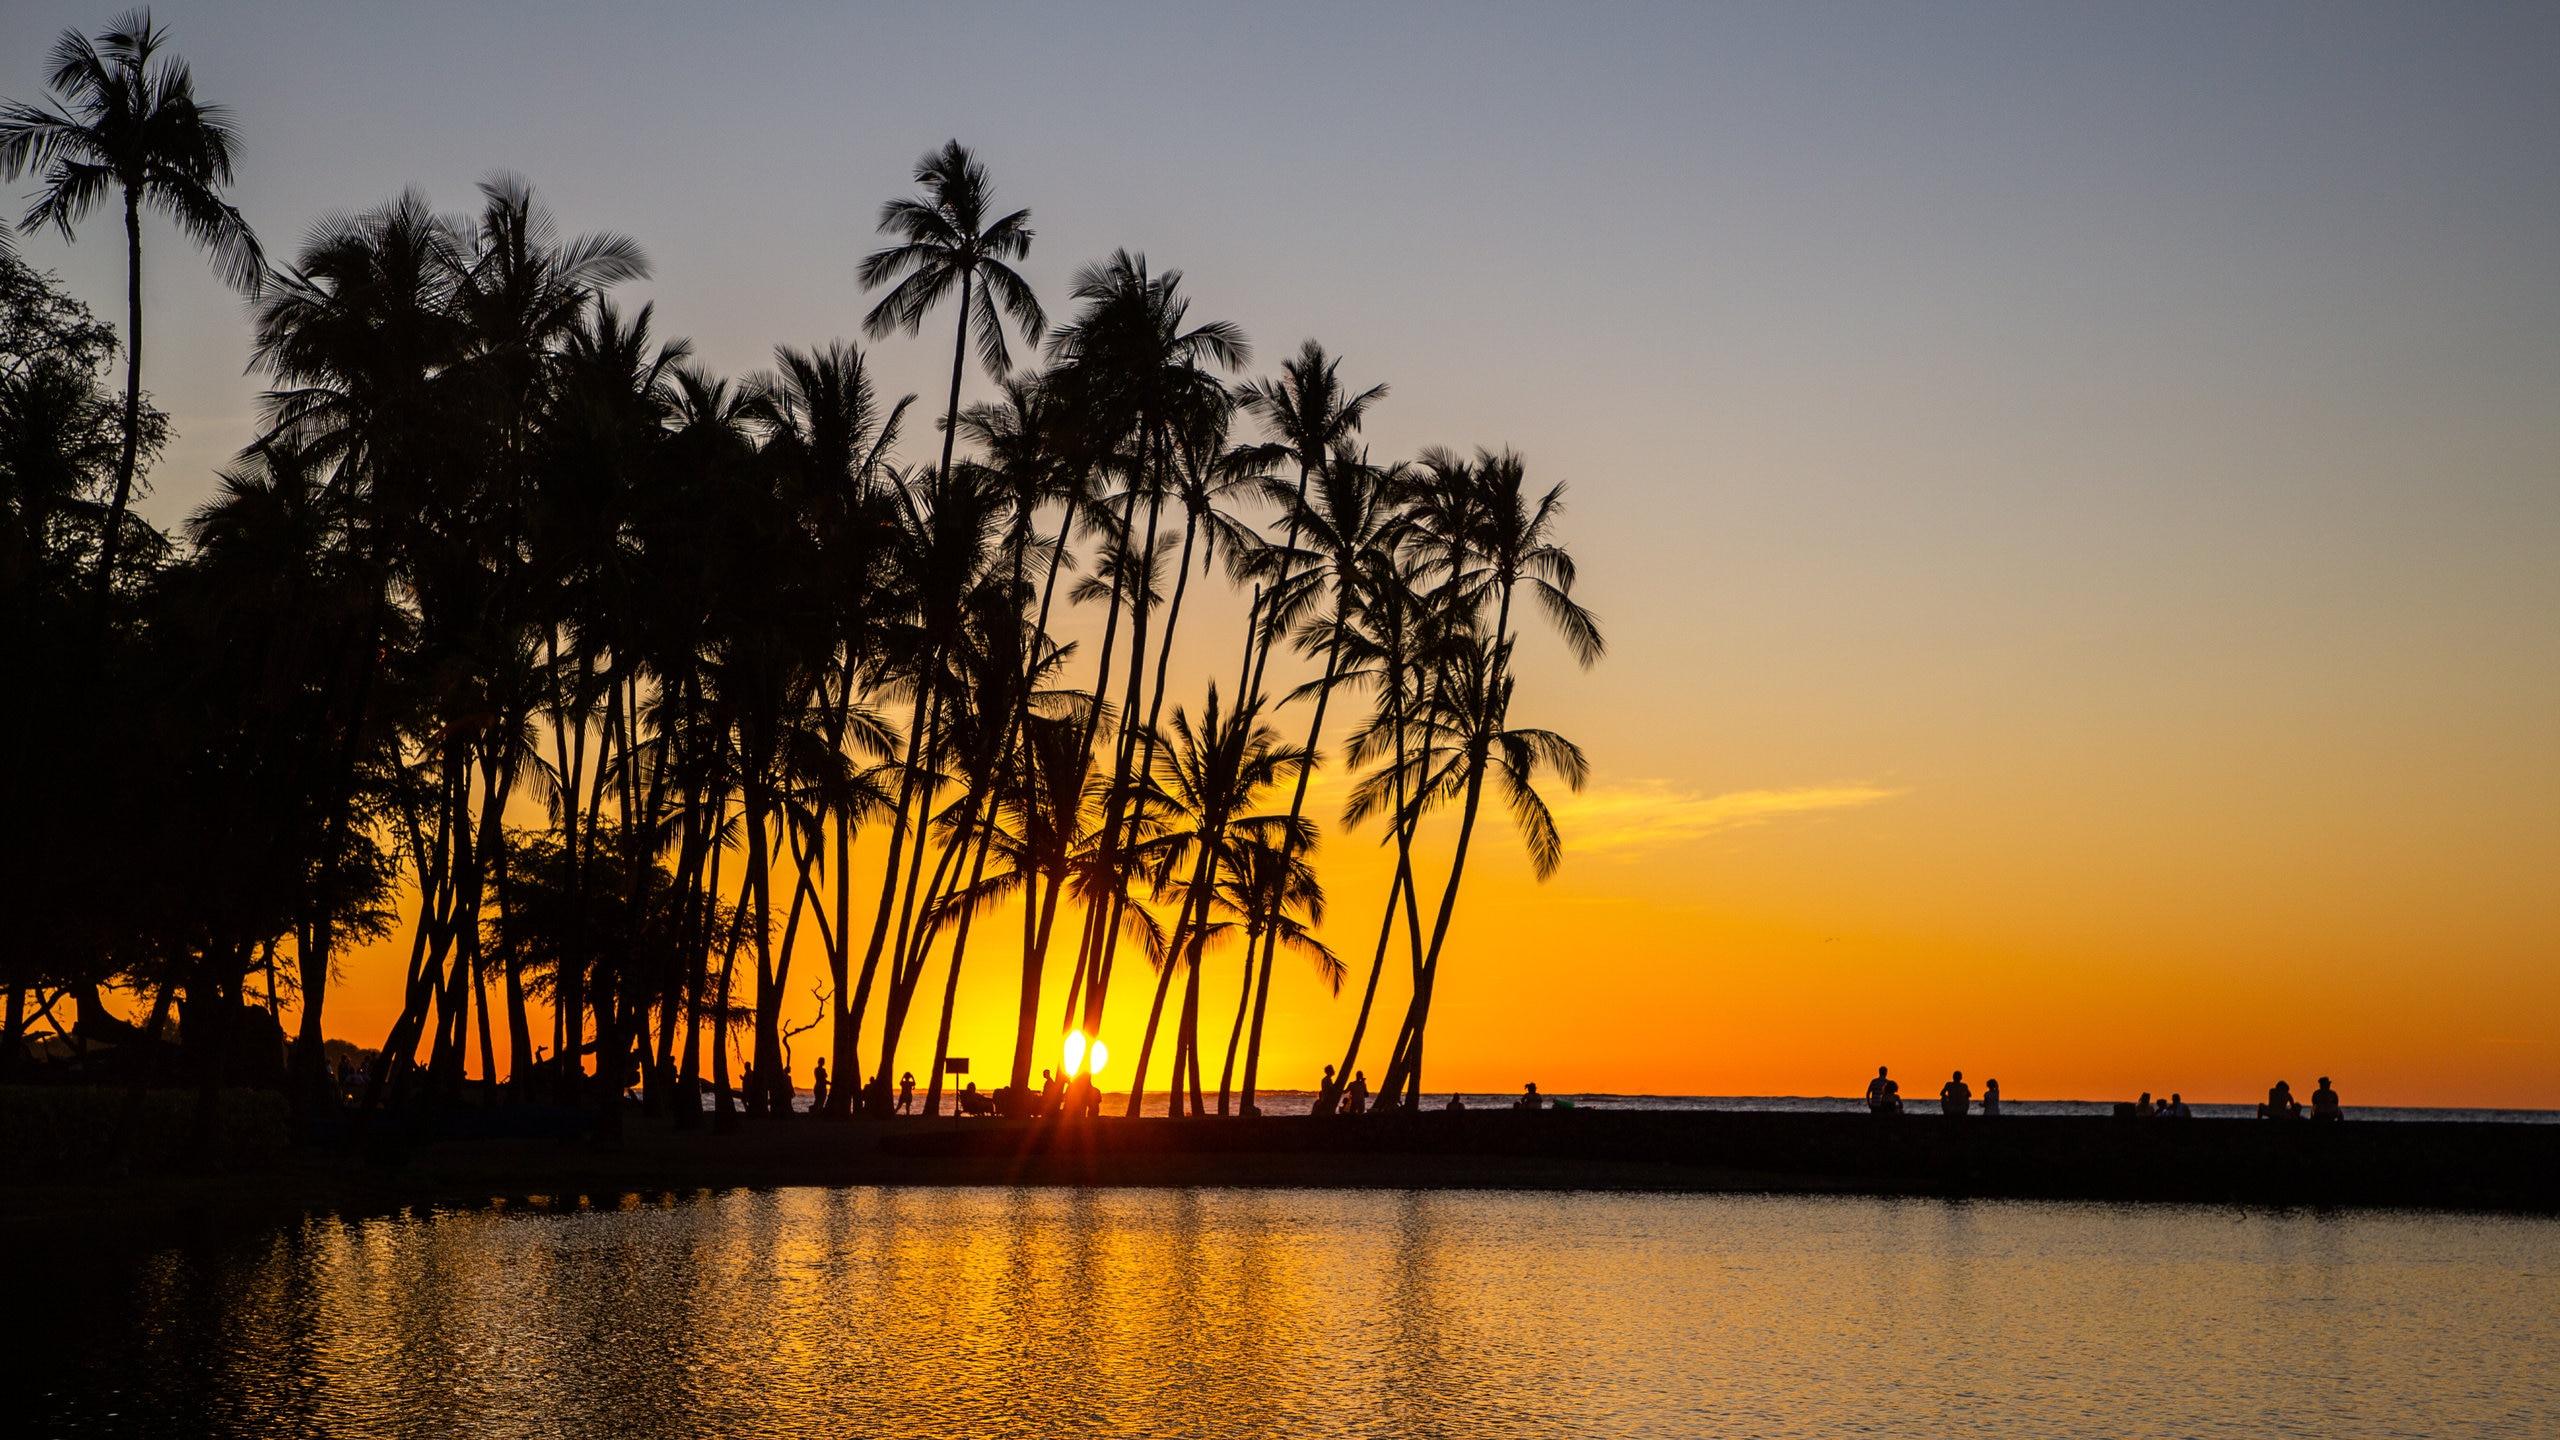 Waikoloa, Hawaii, United States of America